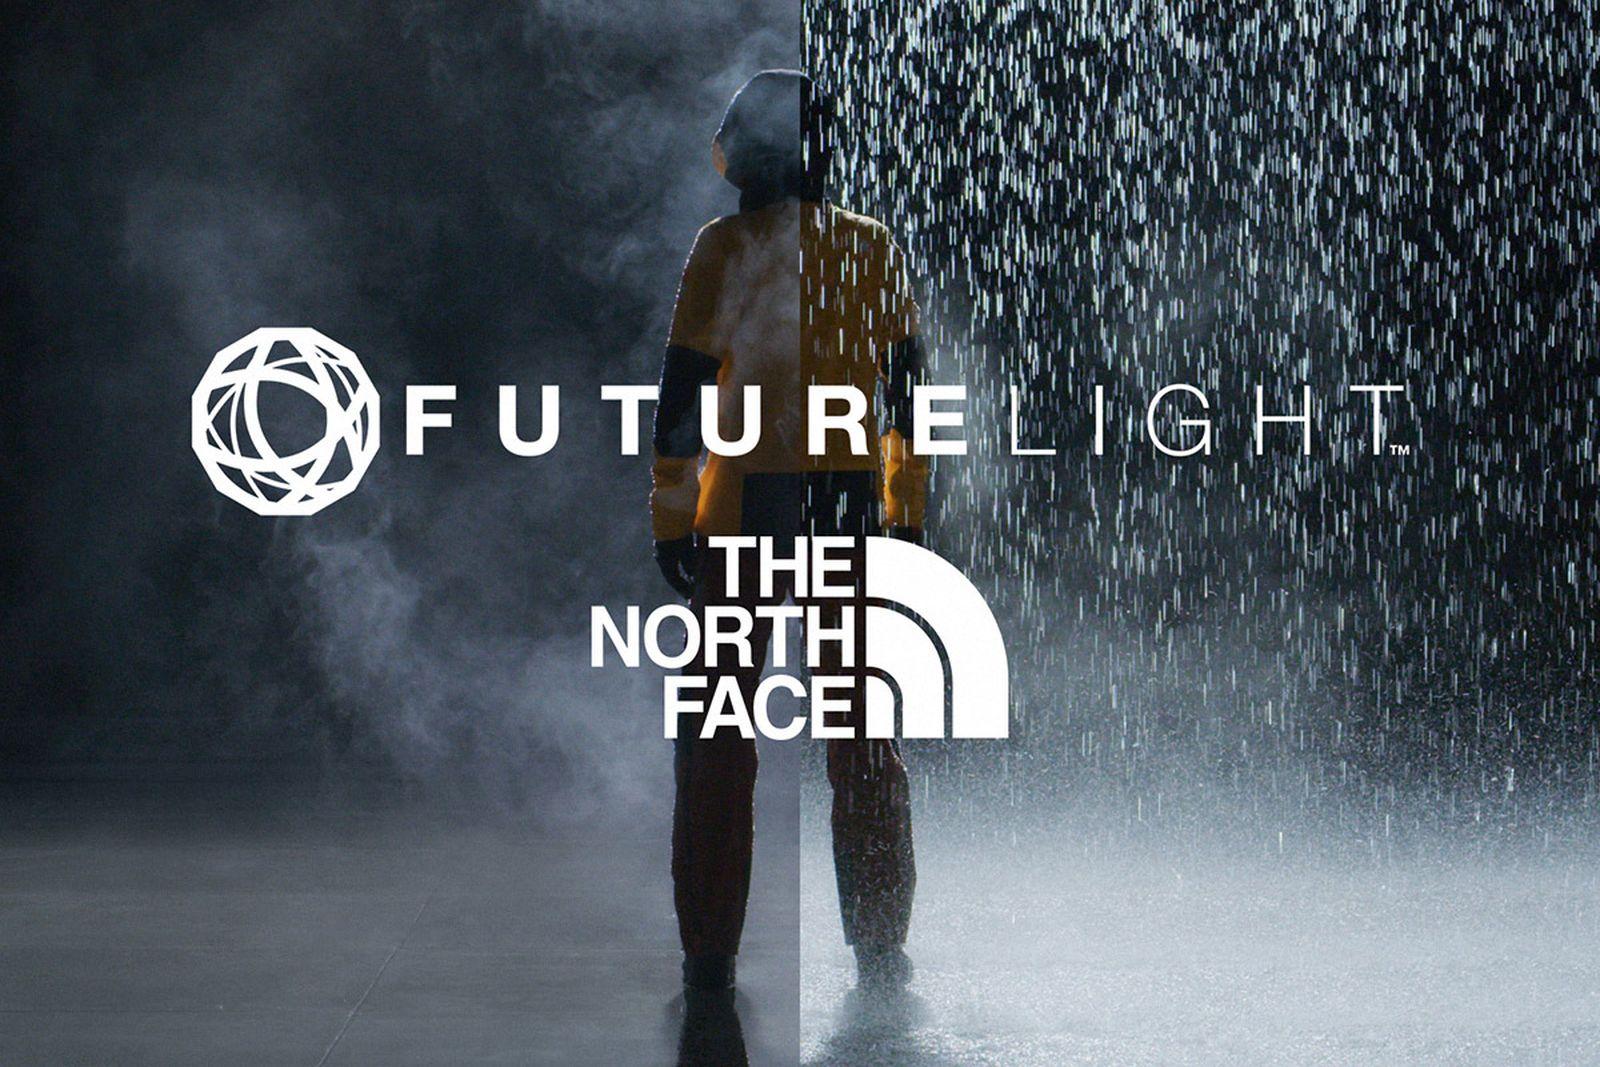 futura-the-north-face-futurelight-lawsuit-main